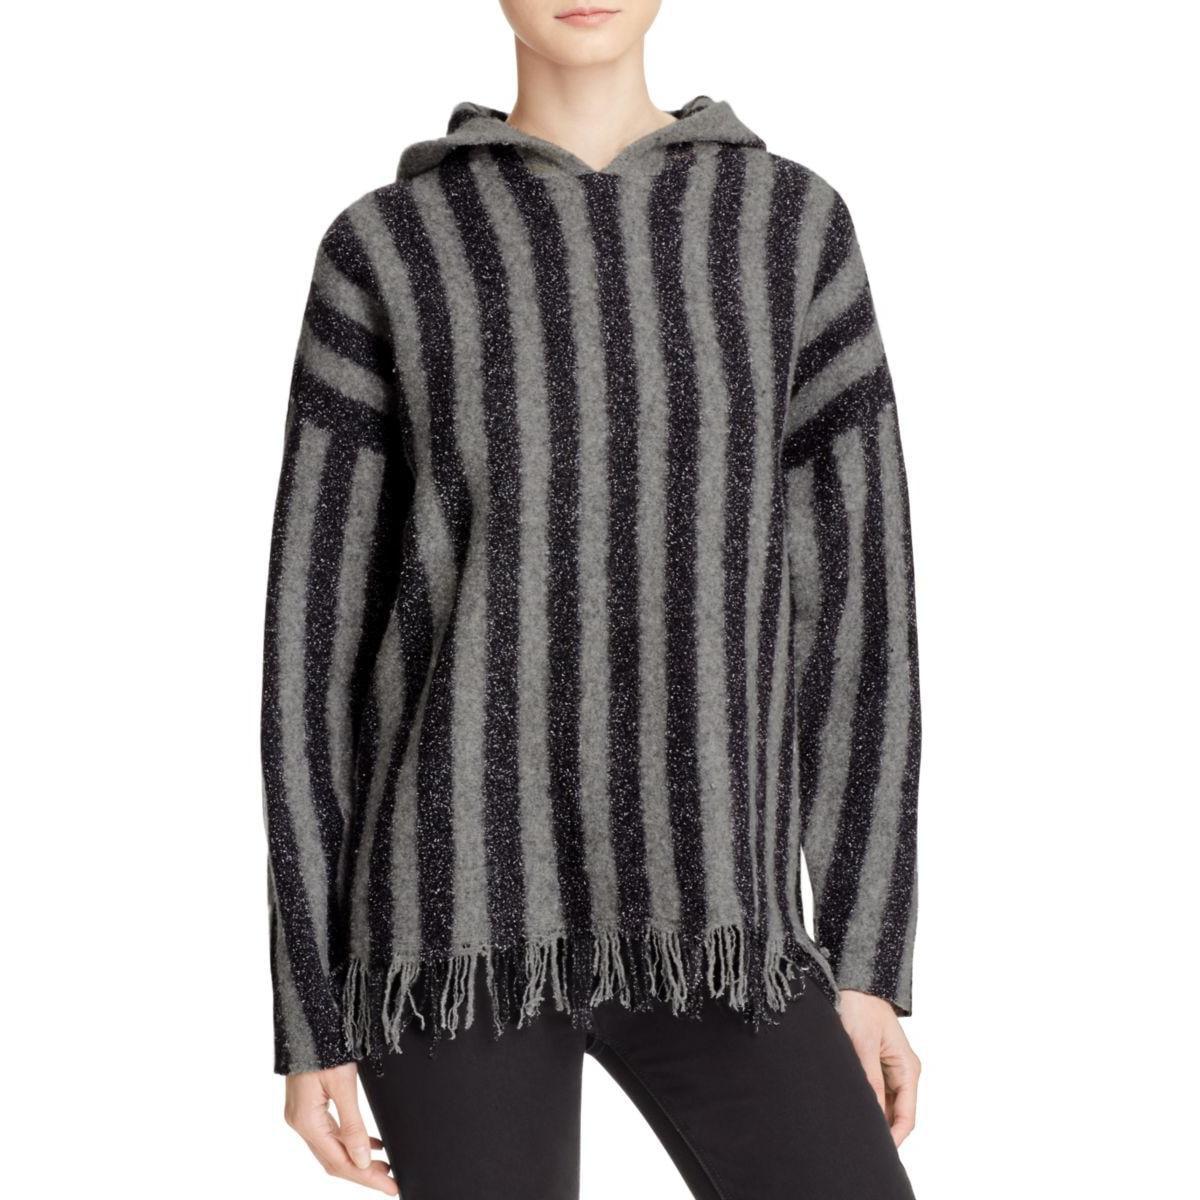 T by Alexander Wang Womens Merino Wool Fringe Hooded Sweater by Womens Wool Coats